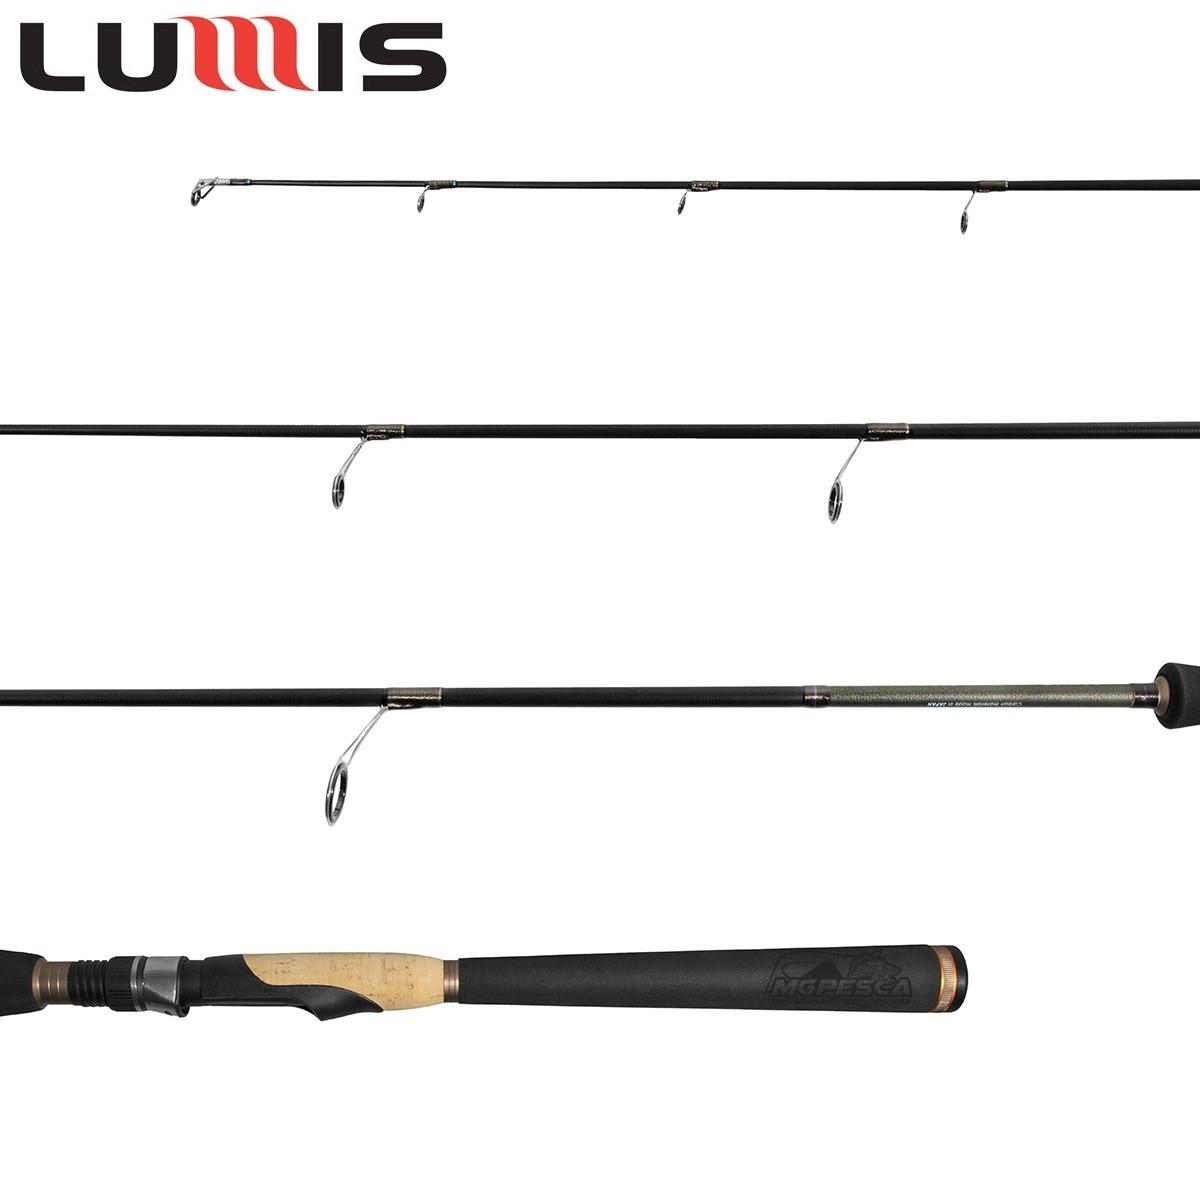 "Vara para molinete Lumis Virotty 6"" (1,83m) 16 lbs VRS60161M  - MGPesca"